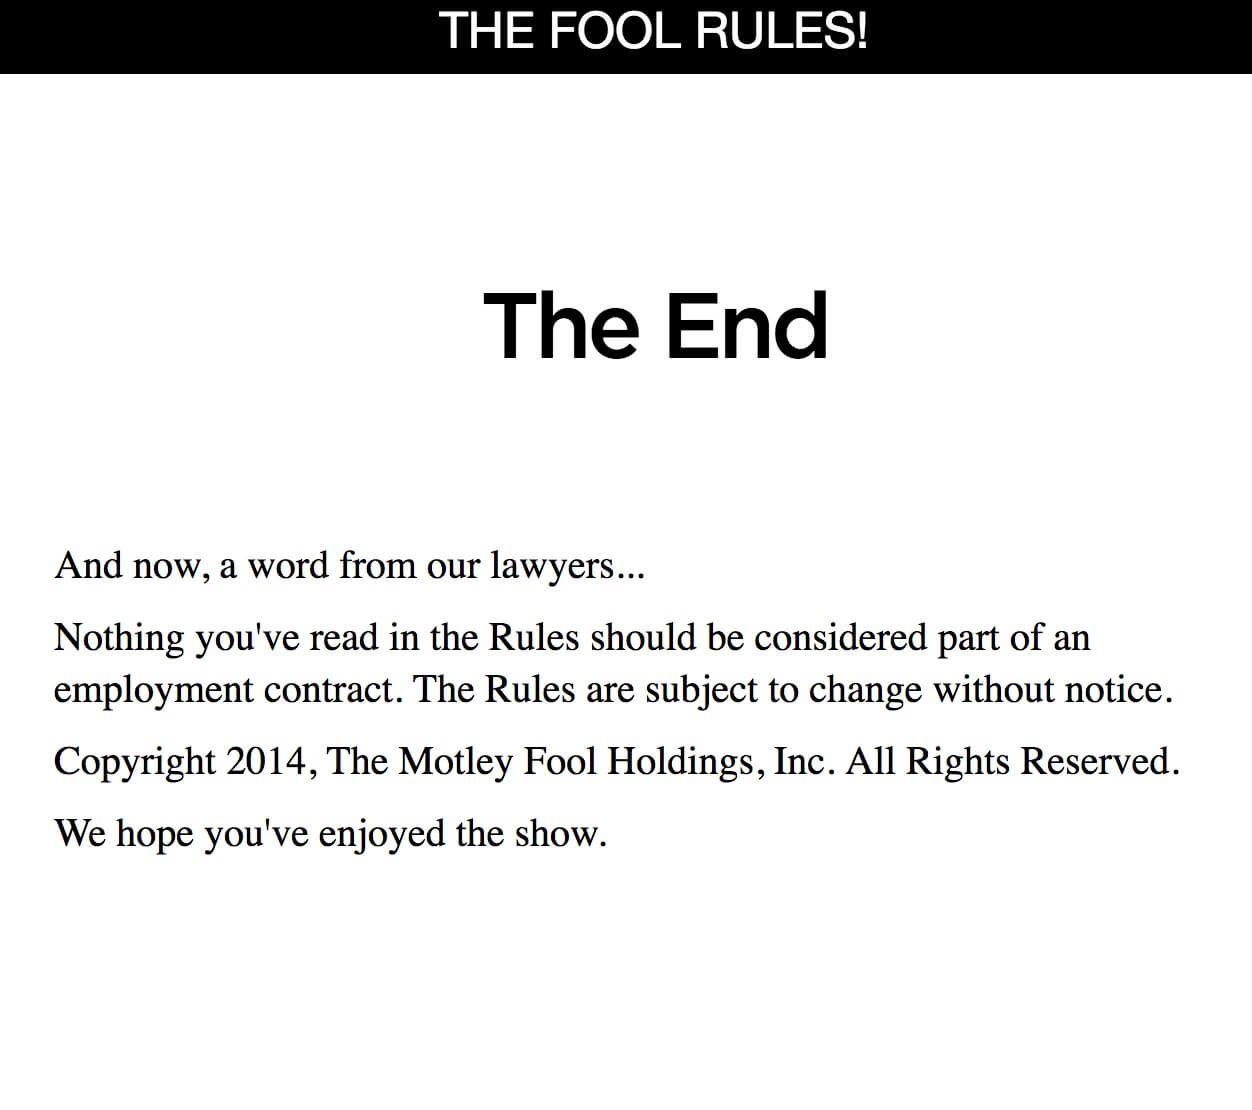 008 Outstanding Free Employee Handbook Template Word Photo  Sample In Training ManualFull